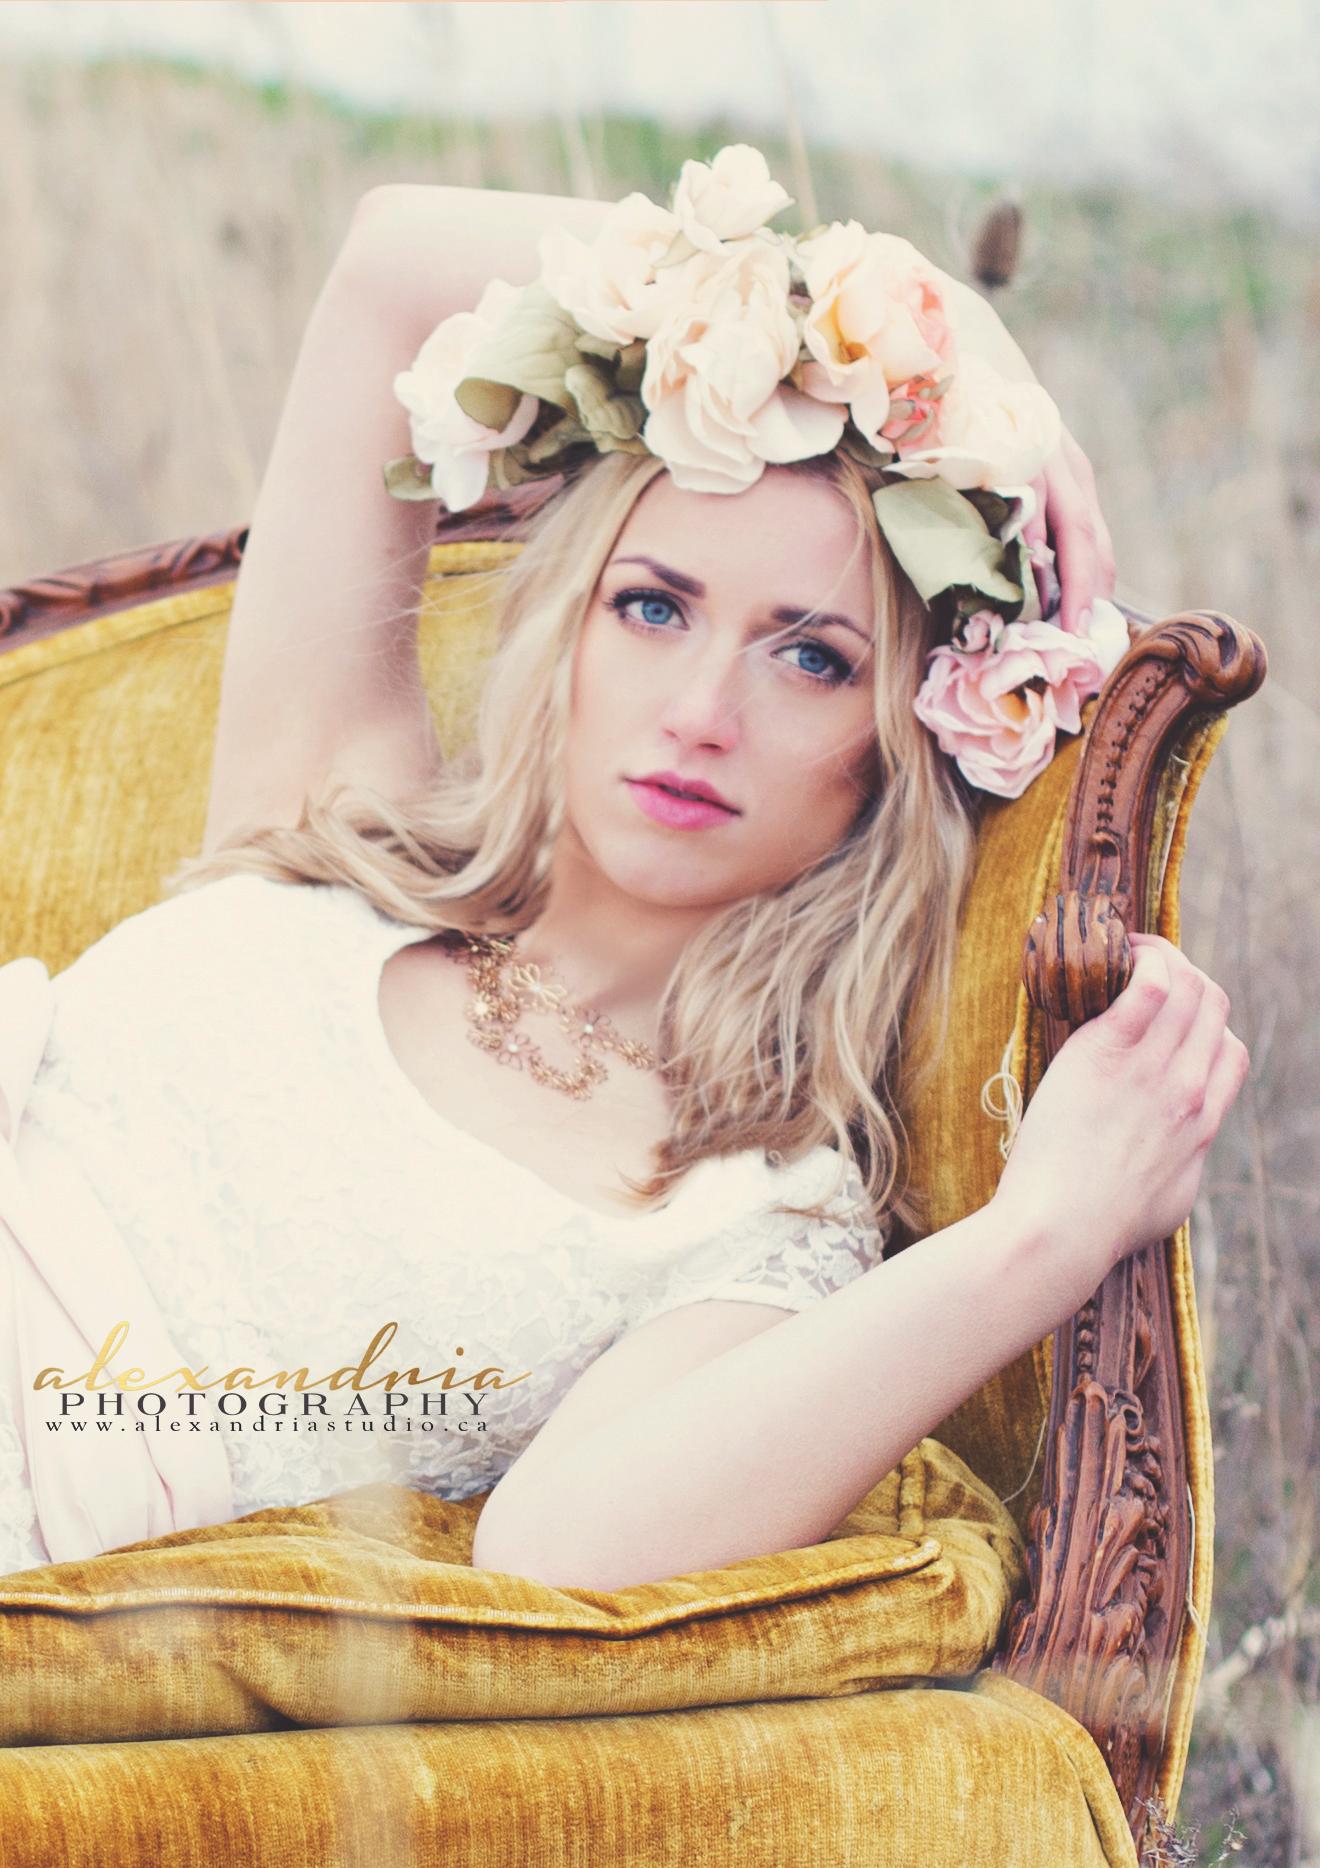 Alexandria Photography www.alexandriastudio.ca 005 copy.jpg